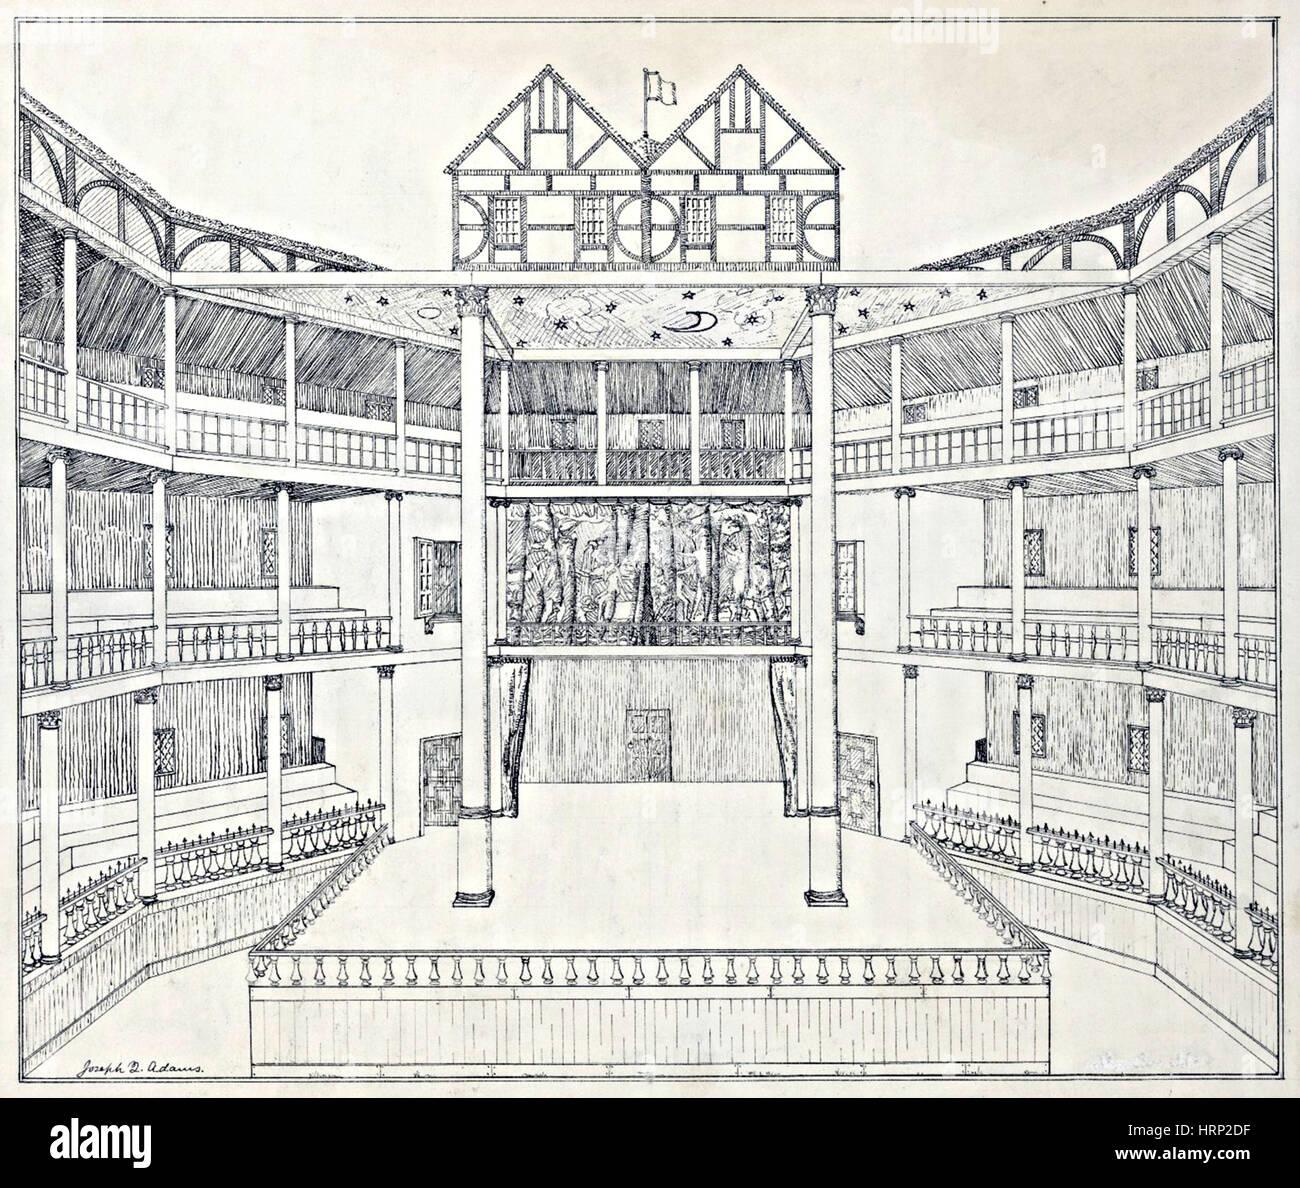 shakespeare 39 s globe theatre reconstruction stock photo. Black Bedroom Furniture Sets. Home Design Ideas